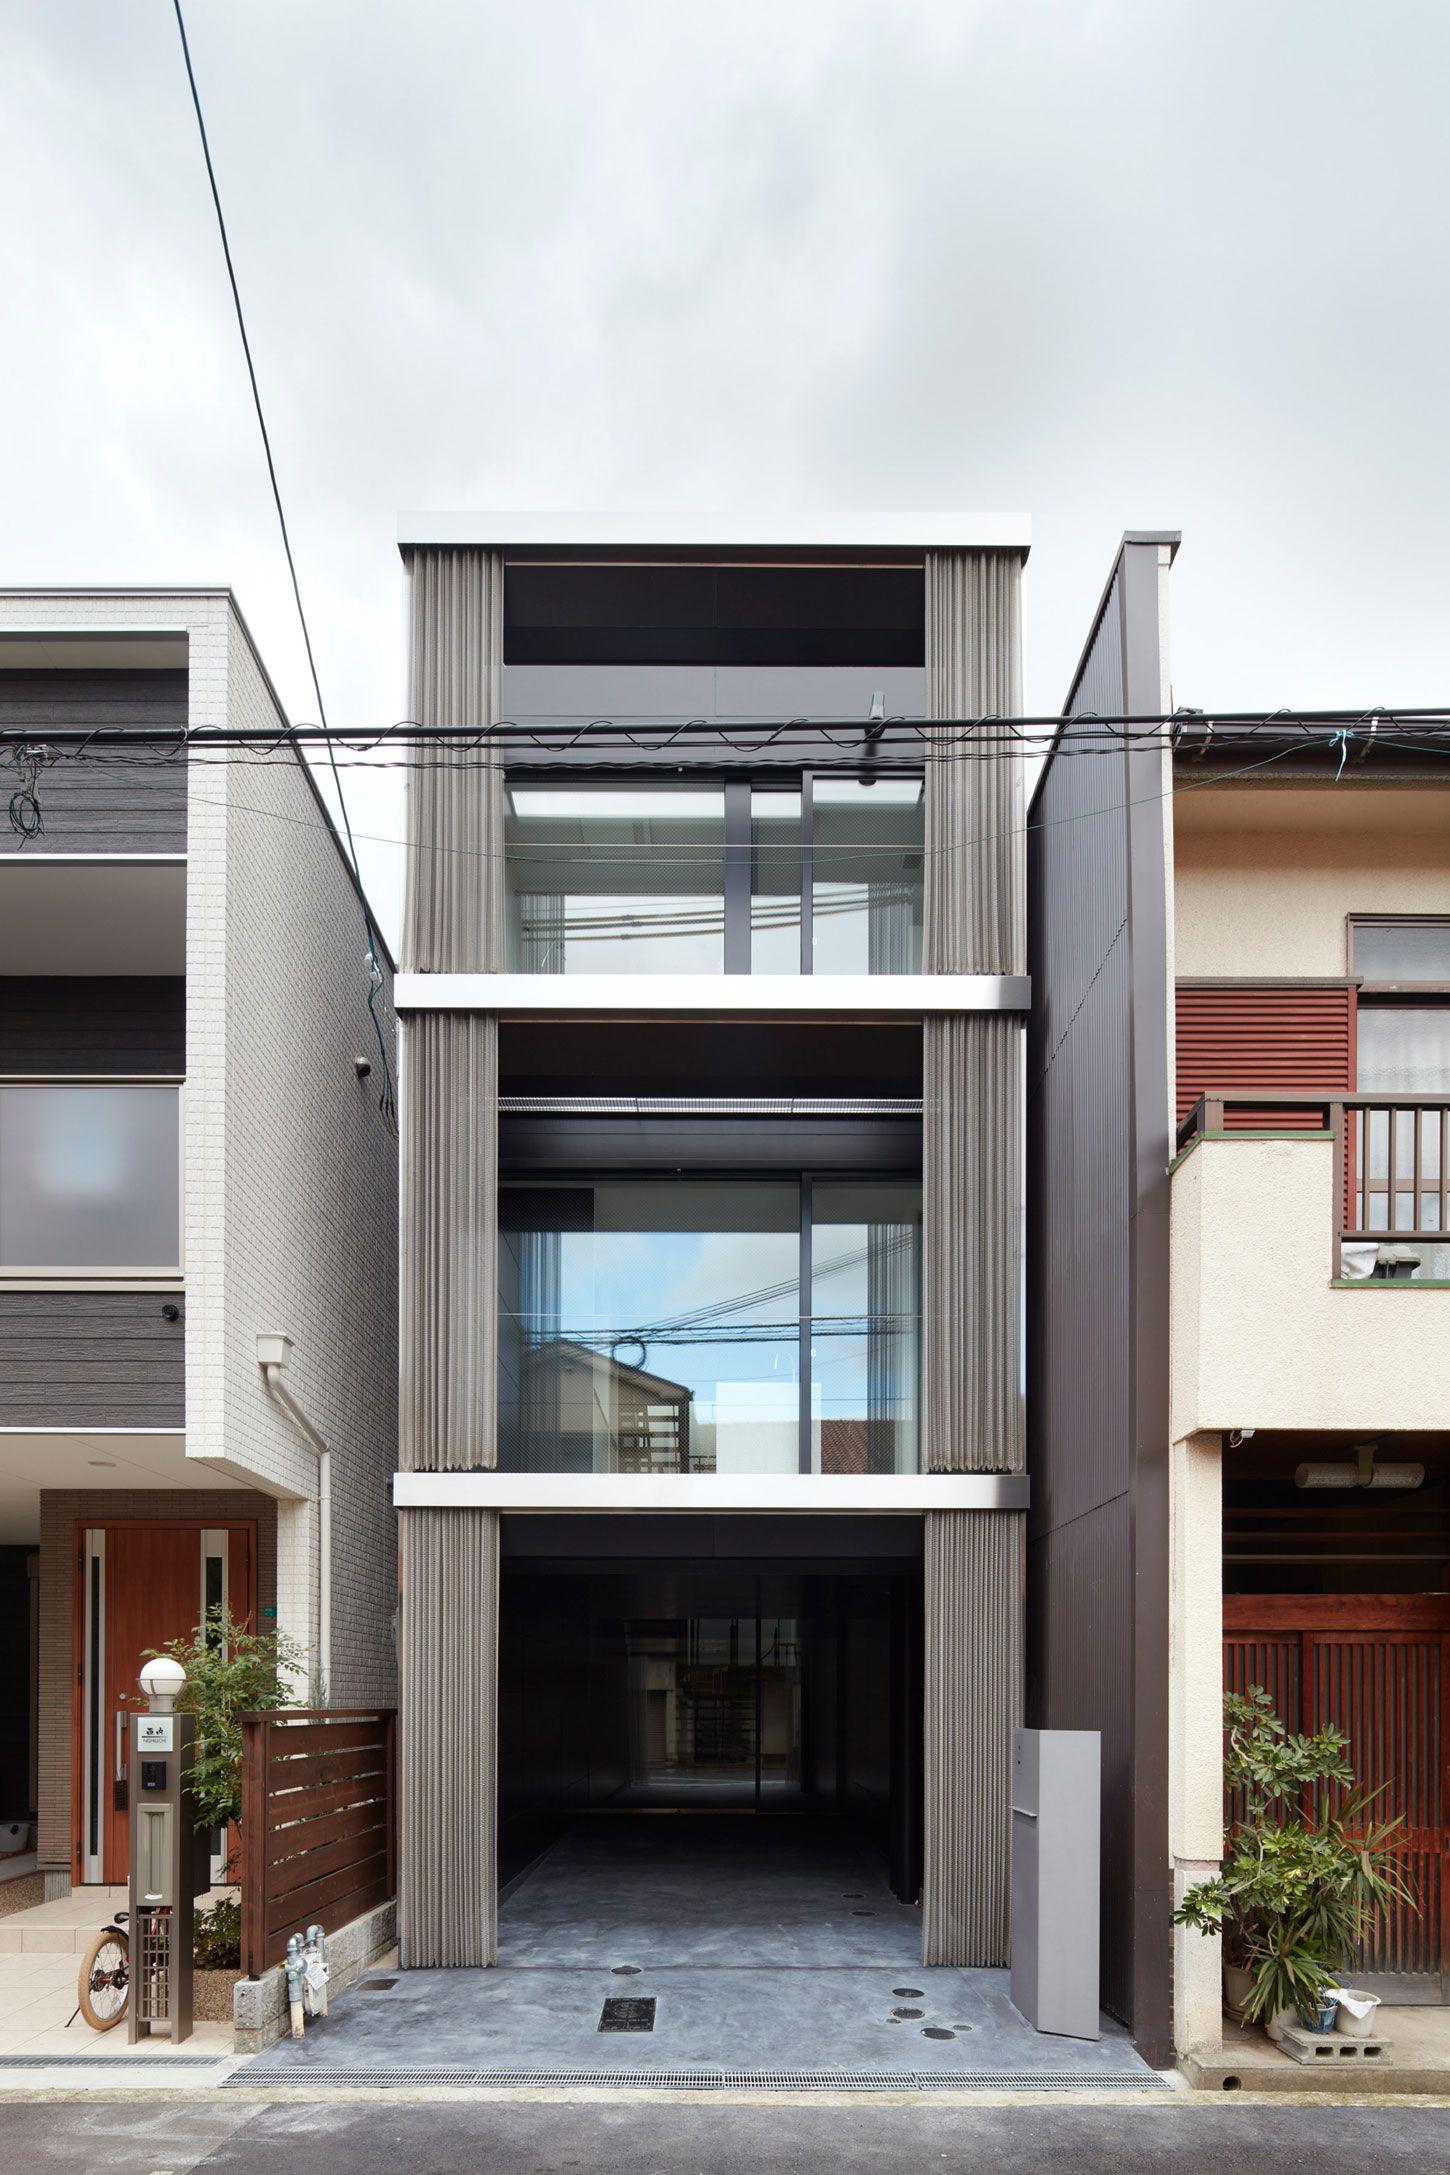 An ingenious vertical home honshu osaka japan minimalist architecture modern architecture house